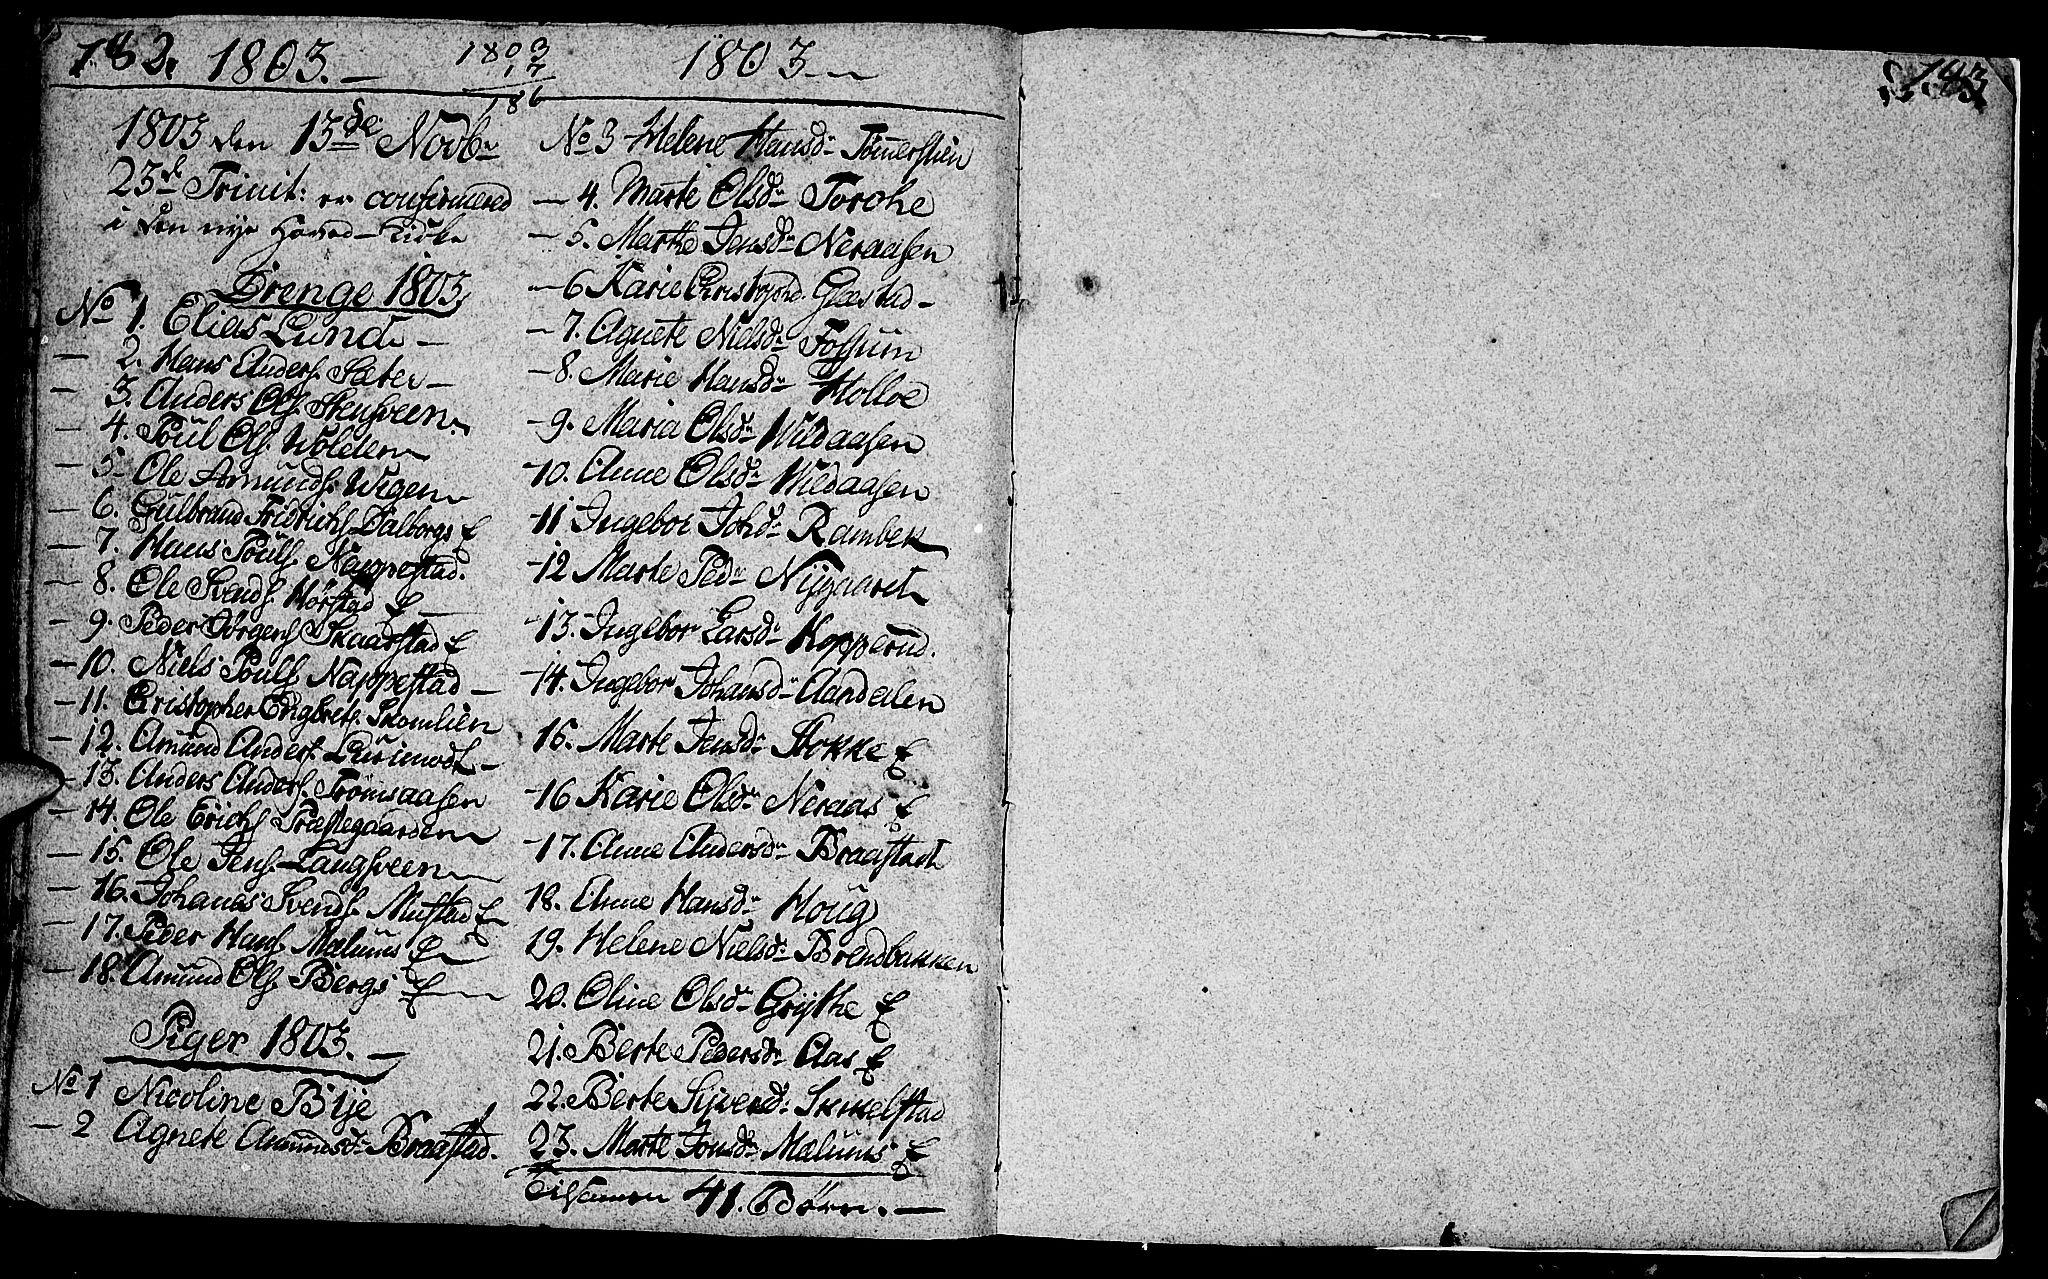 SAH, Vardal prestekontor, H/Ha/Hab/L0002: Klokkerbok nr. 2, 1790-1803, s. 182-183